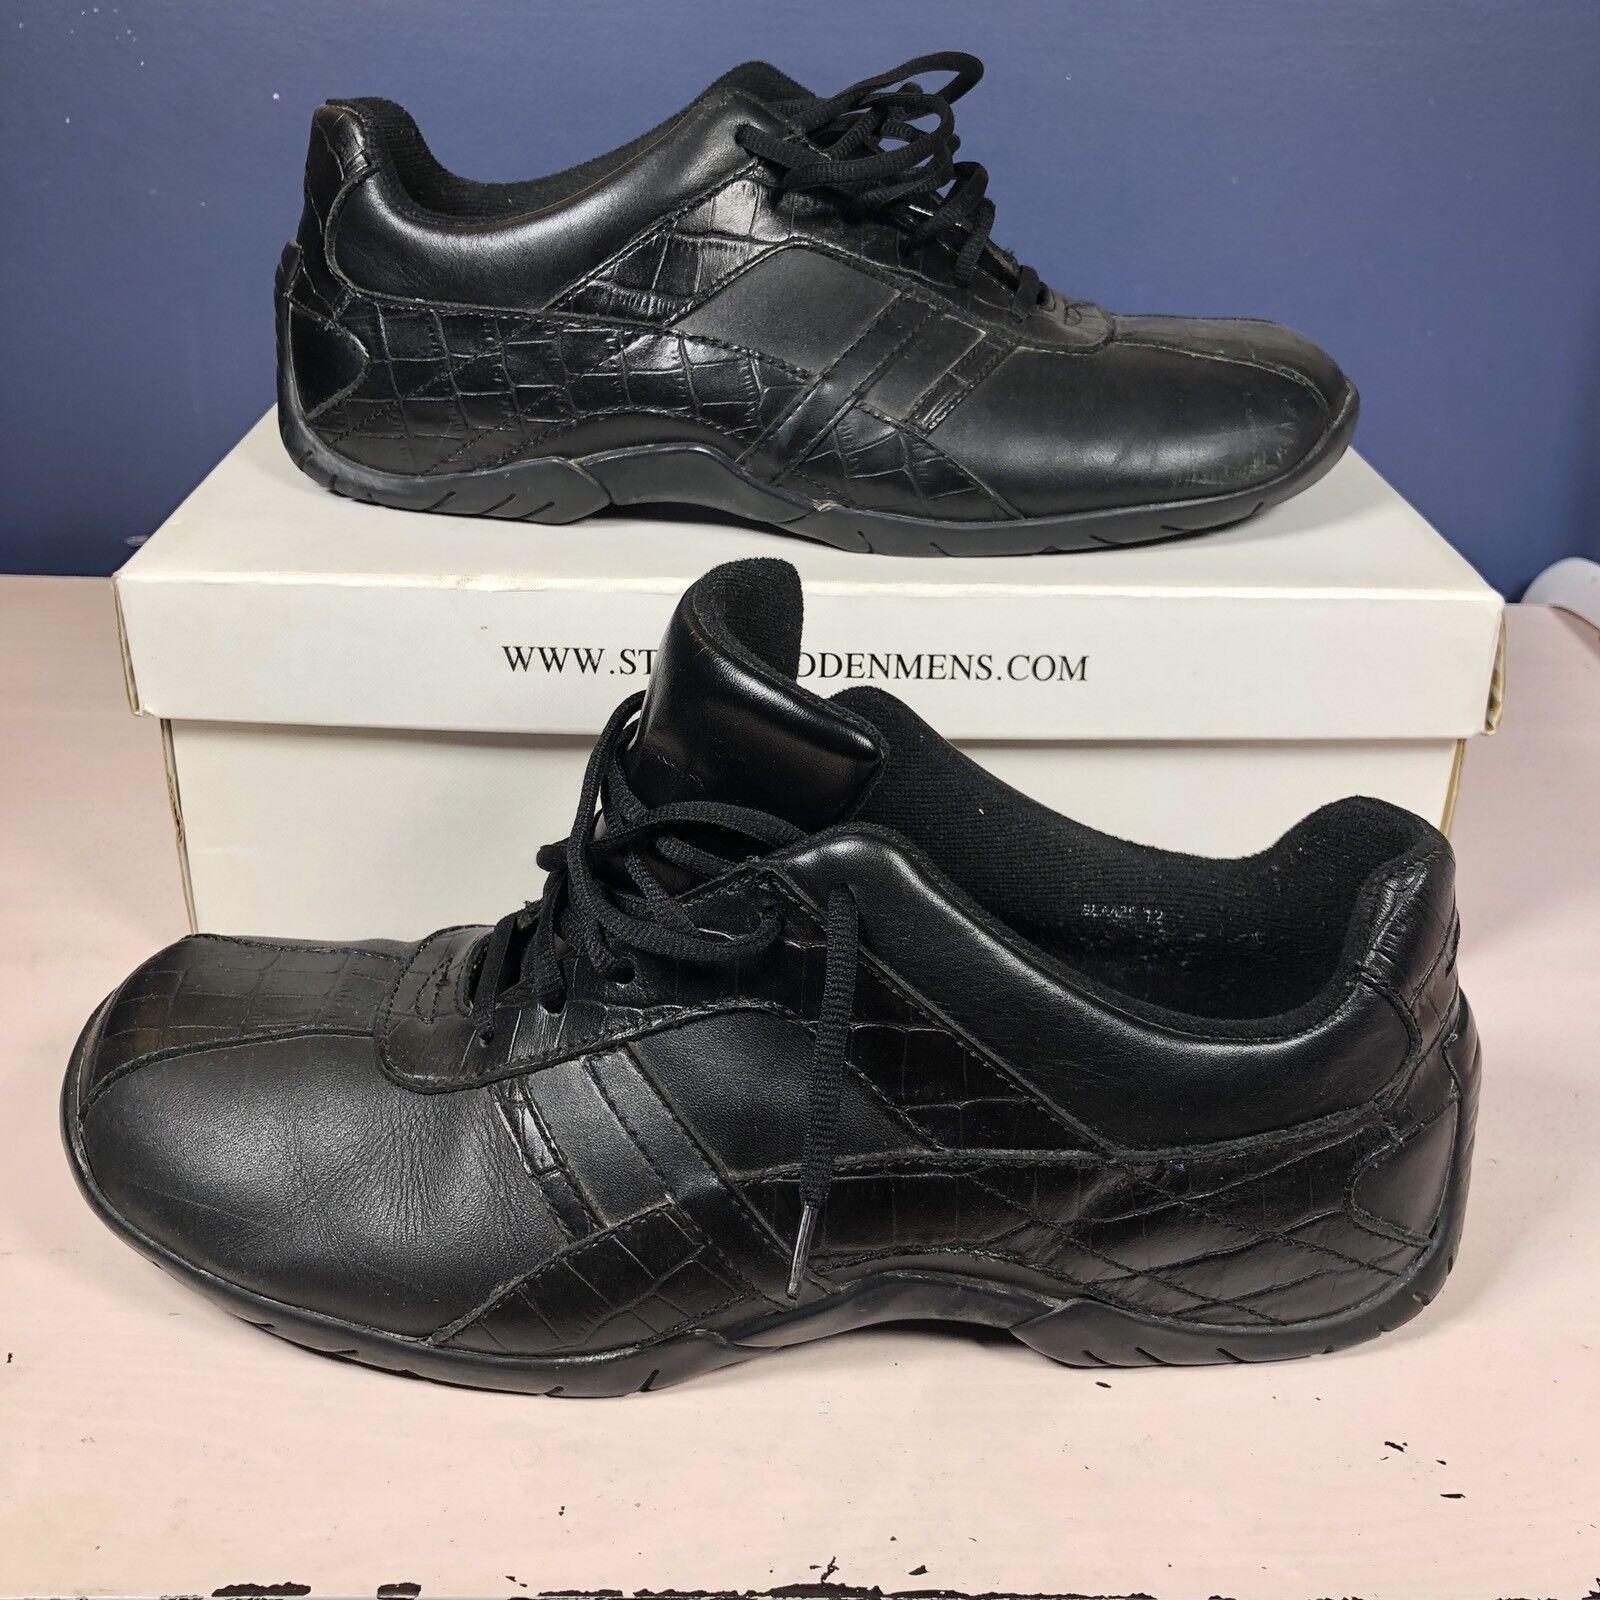 Steve Size Madden Men's Shoes Blaaze Size Steve 12 Black Leather Walking Athletic 4acb43